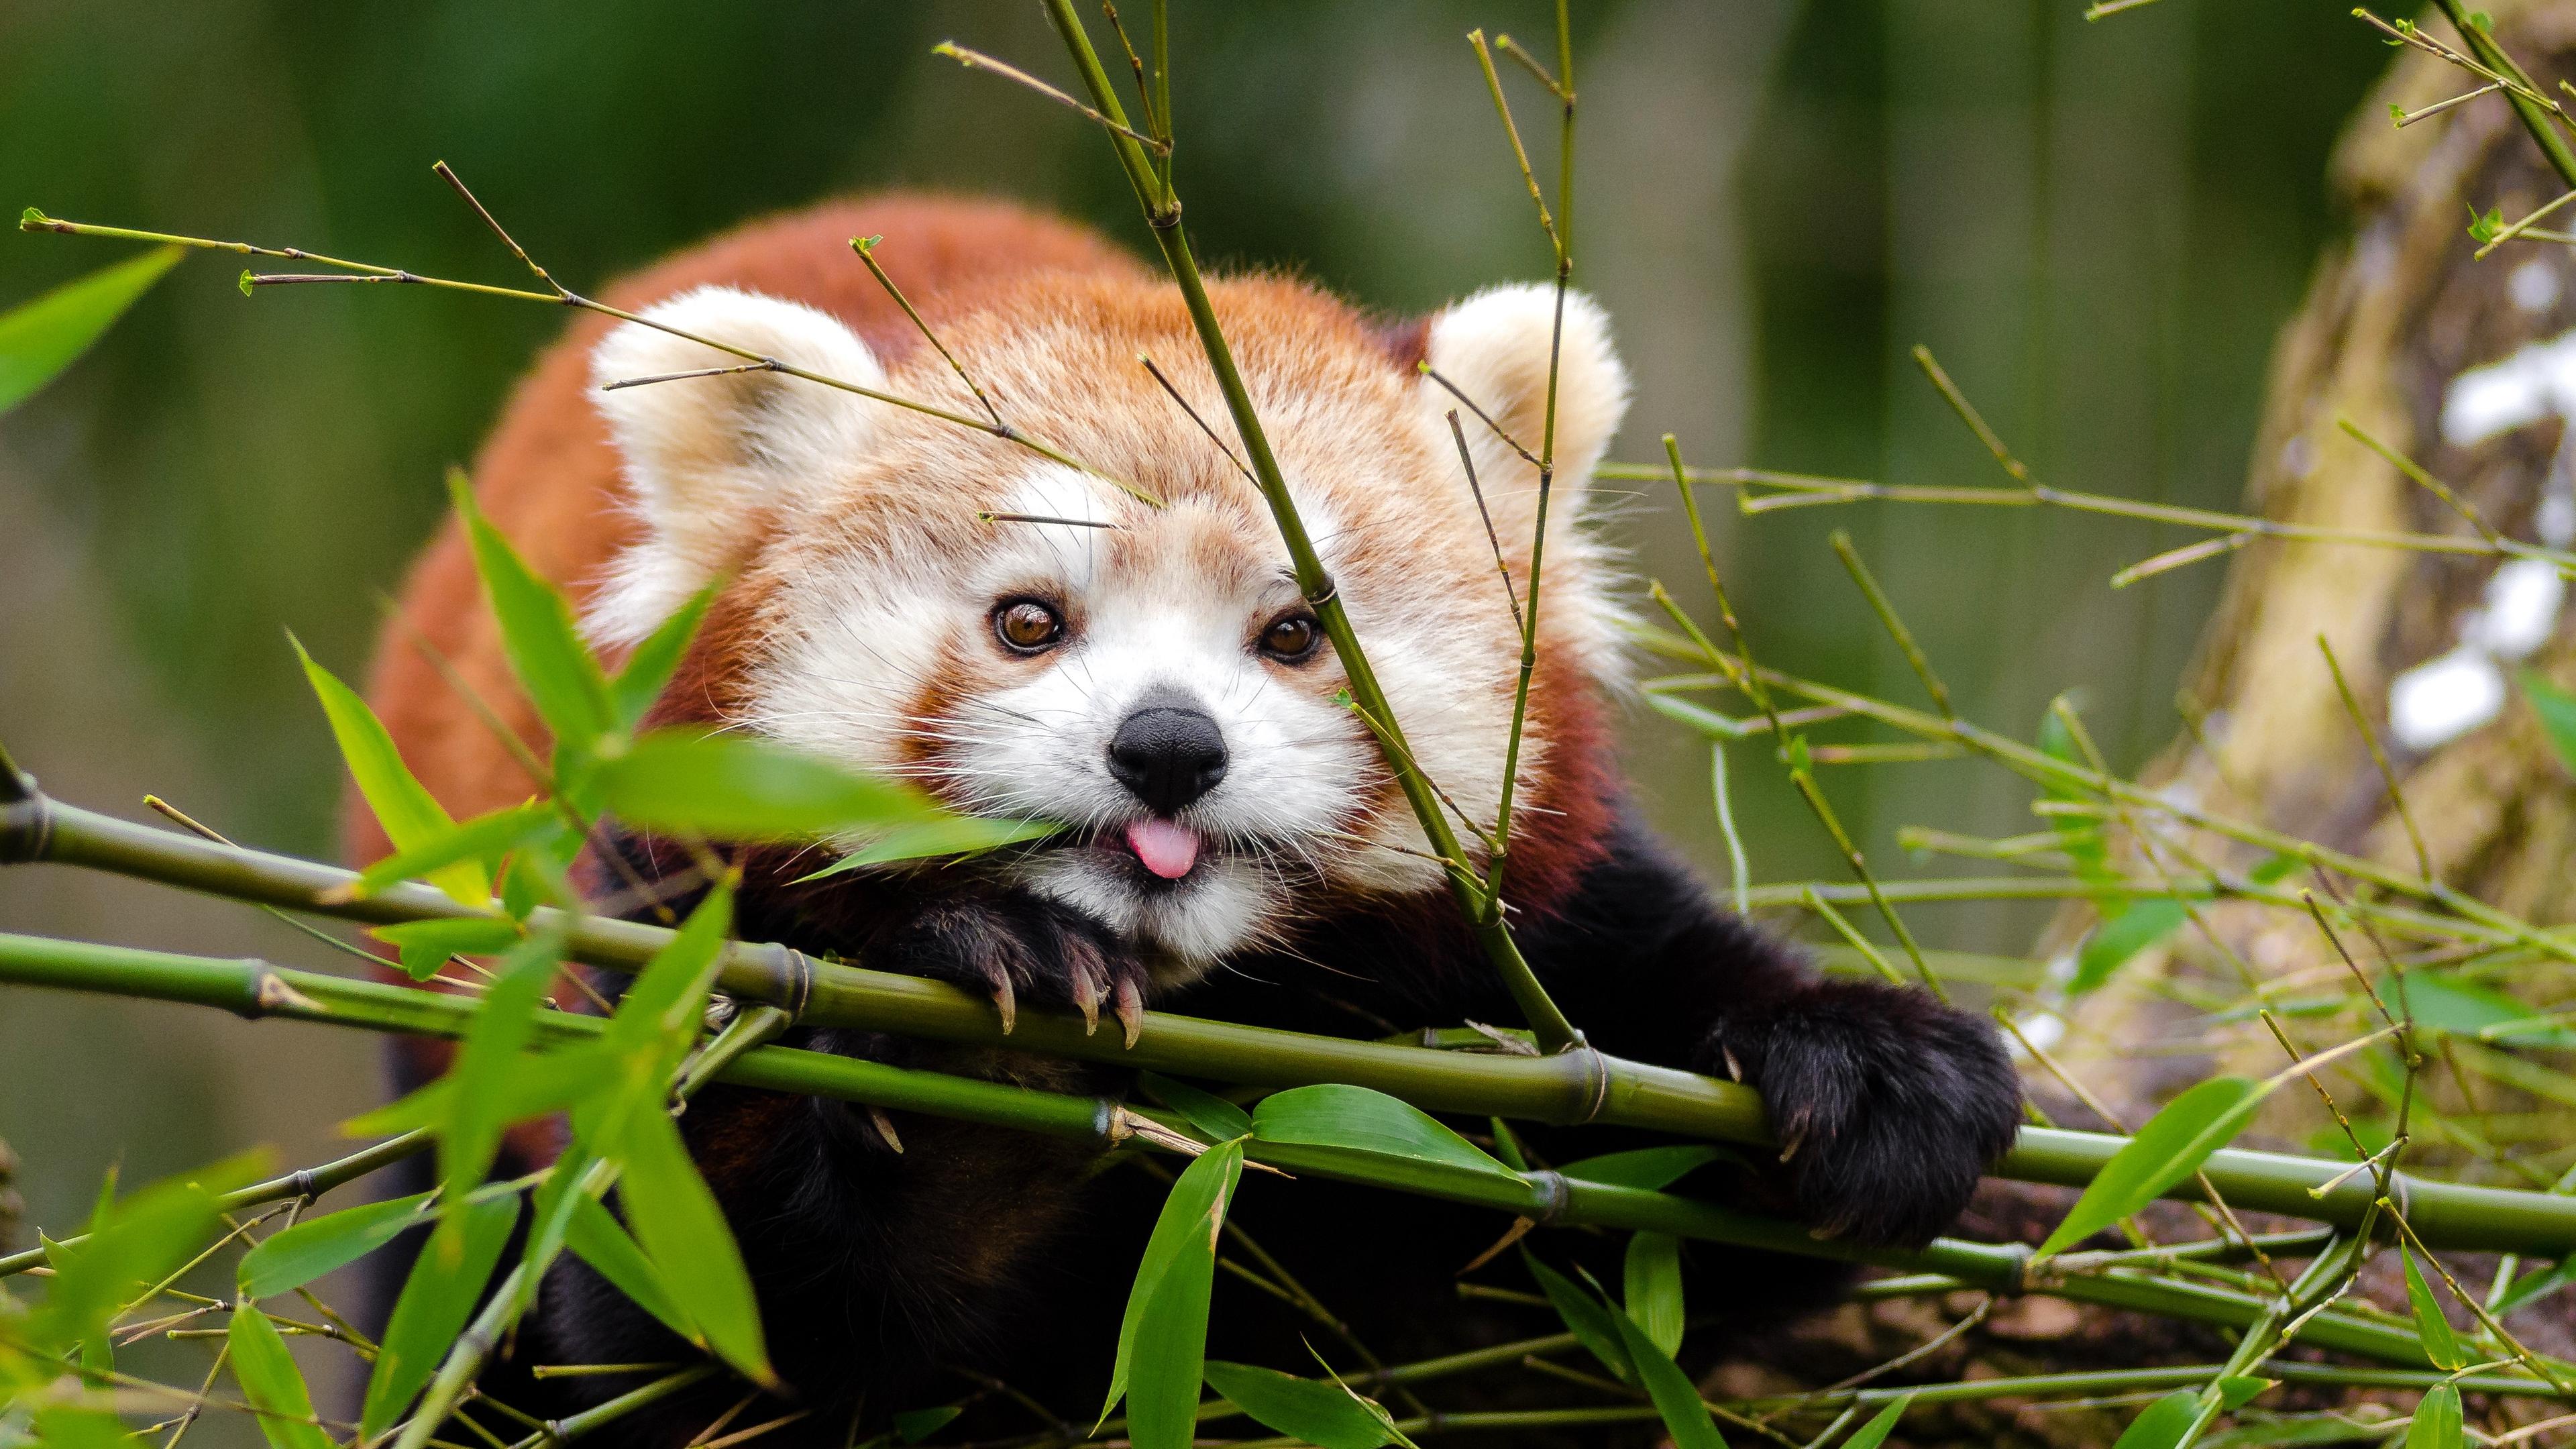 fiery panda red panda protruding tongue funny 4k 1542242089 - fiery panda, red panda, protruding tongue, funny 4k - red panda, protruding tongue, fiery panda